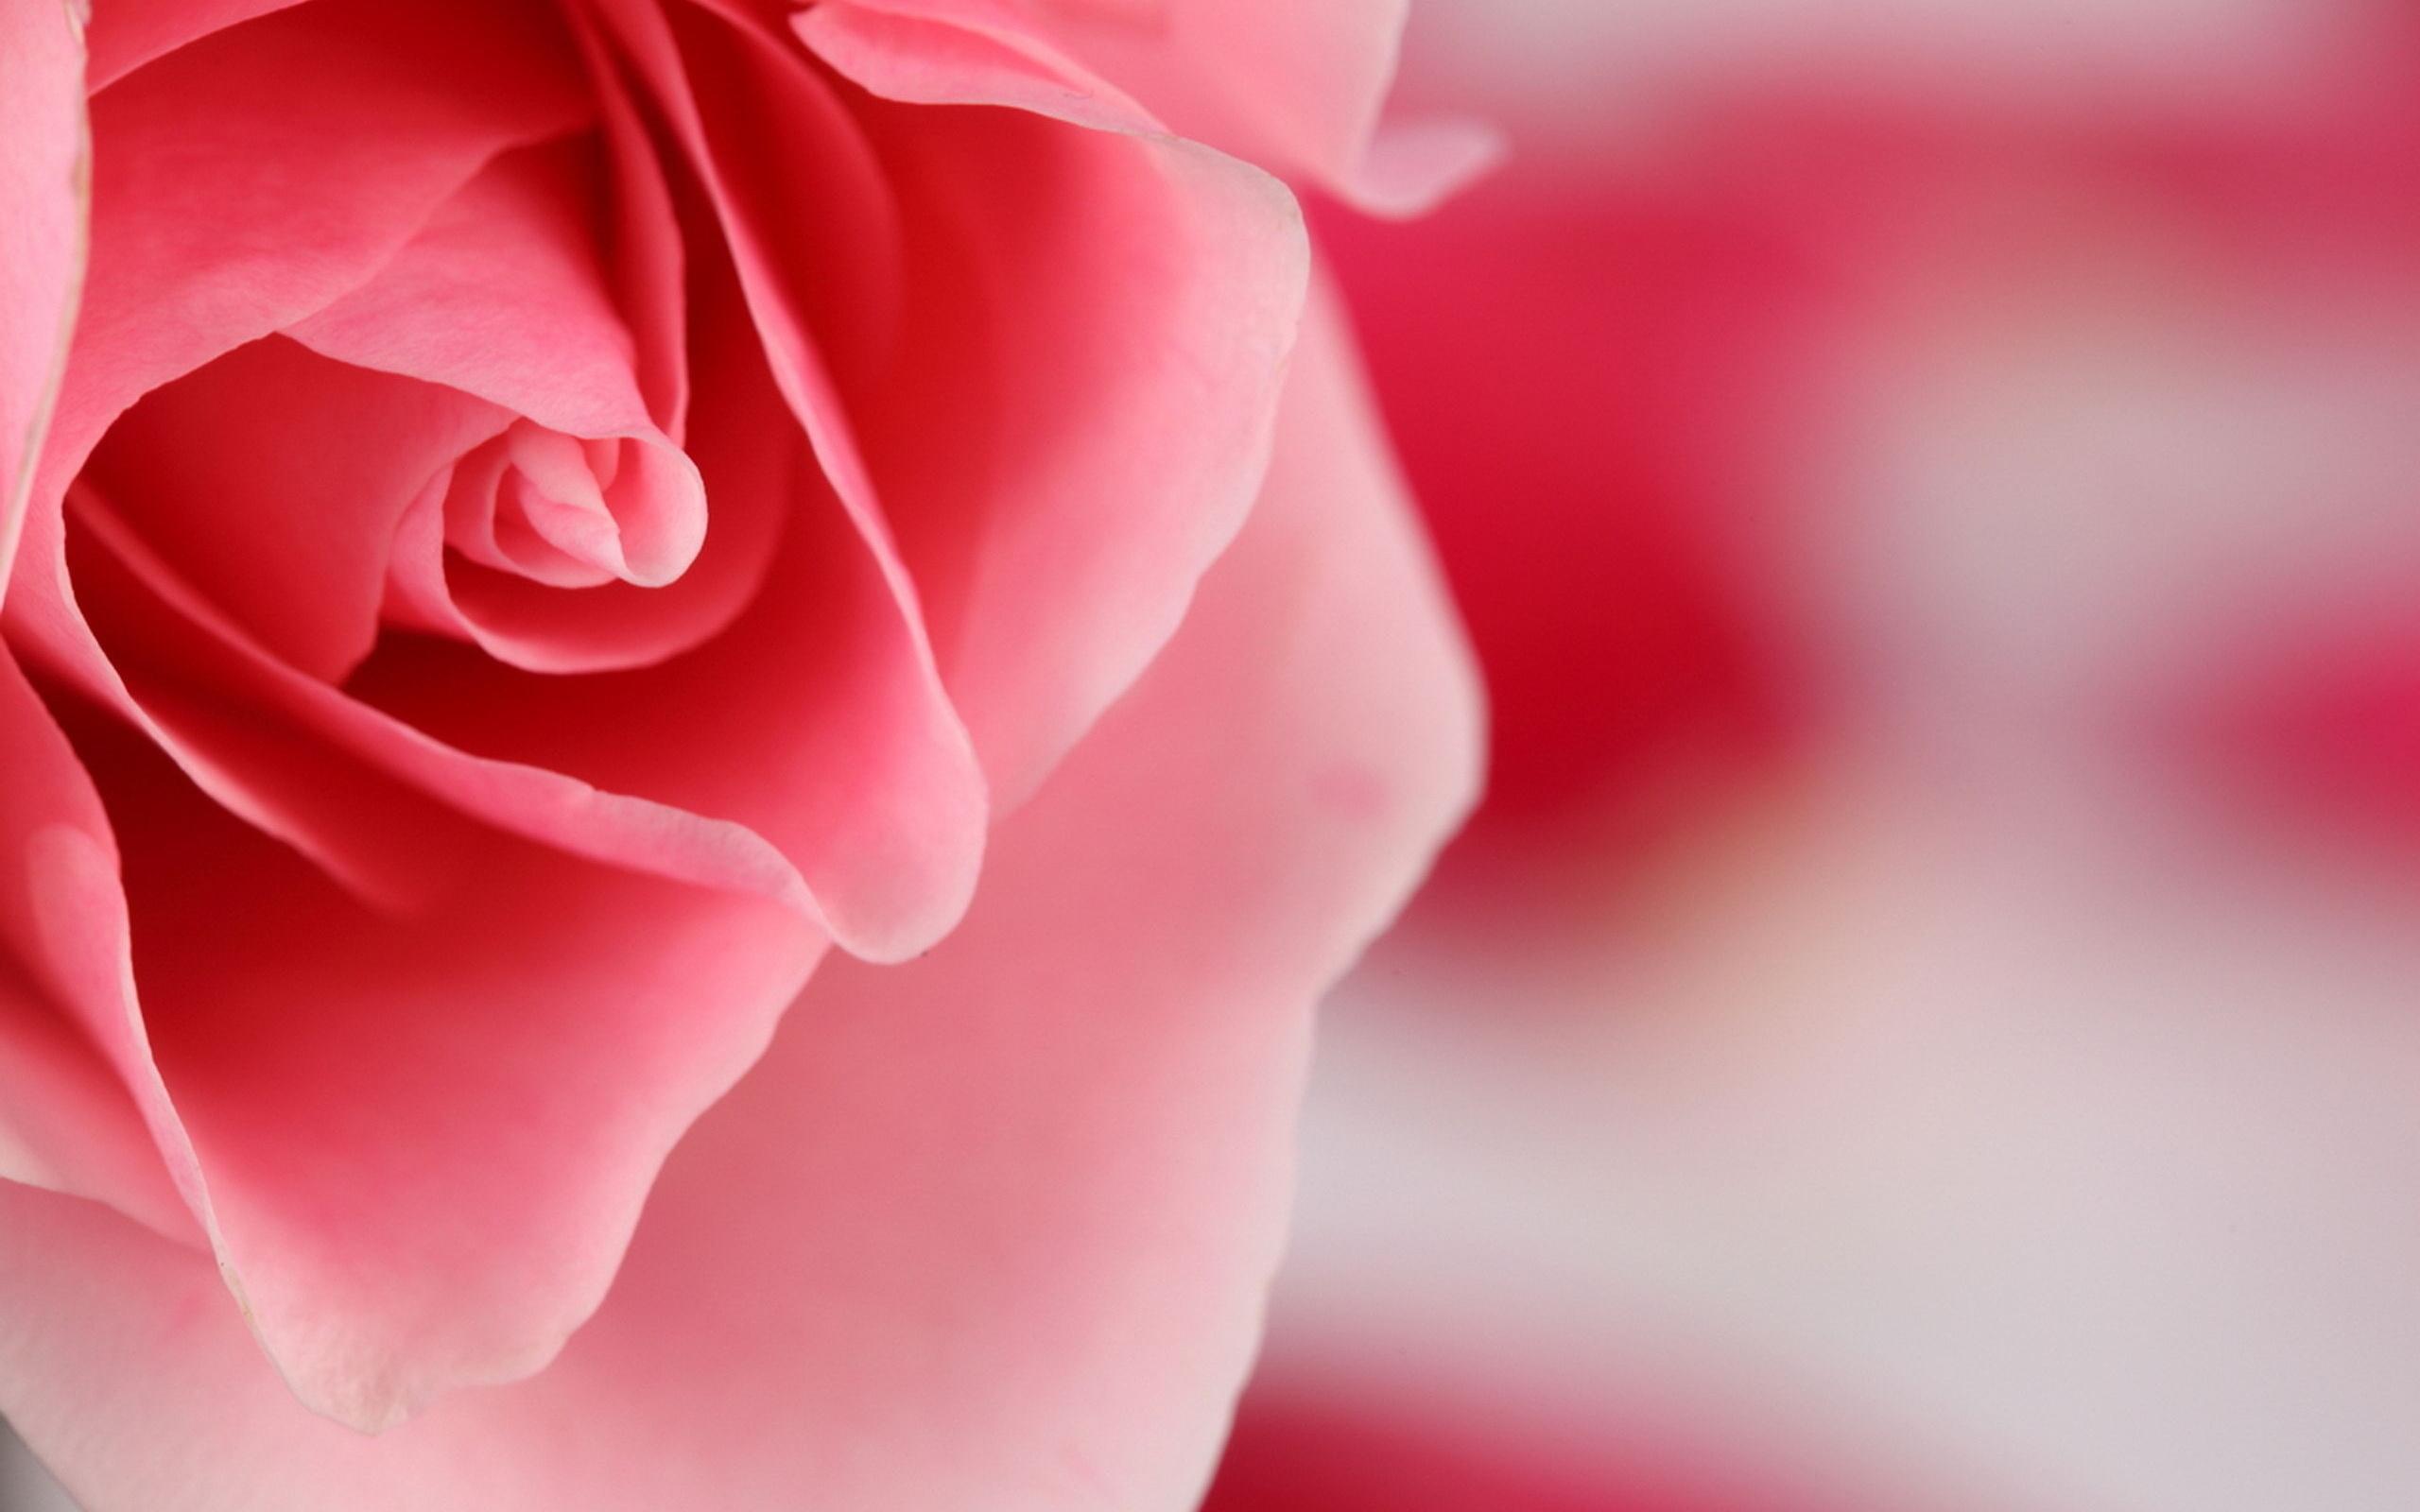 роза, розовый, лепестки, цветок, Макро, цвет